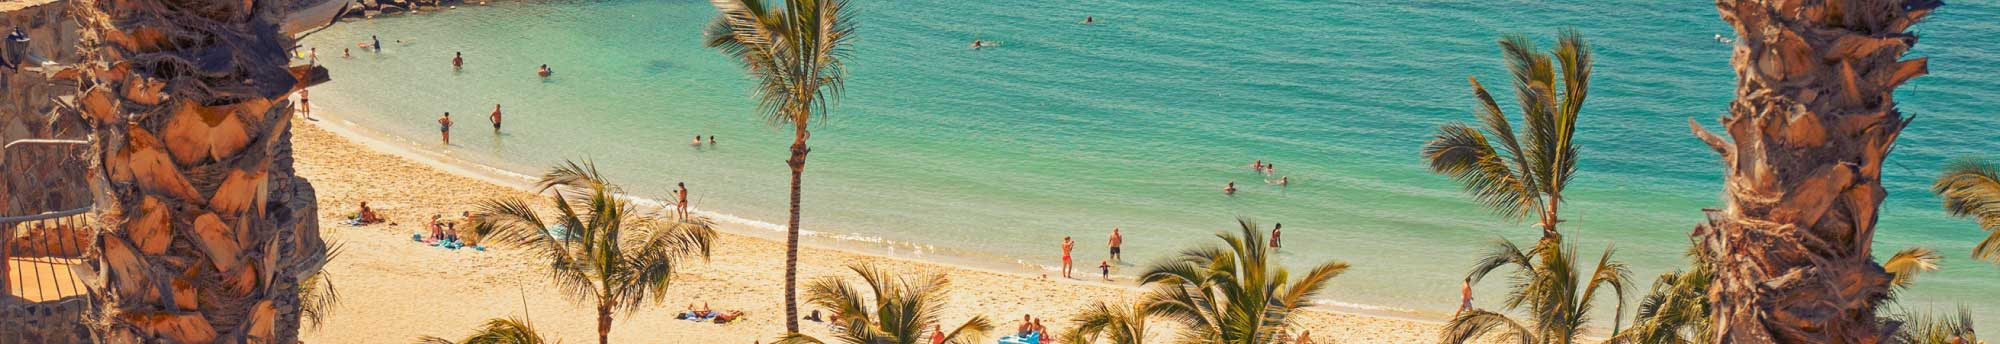 Volo + Hotel a Gran Canaria